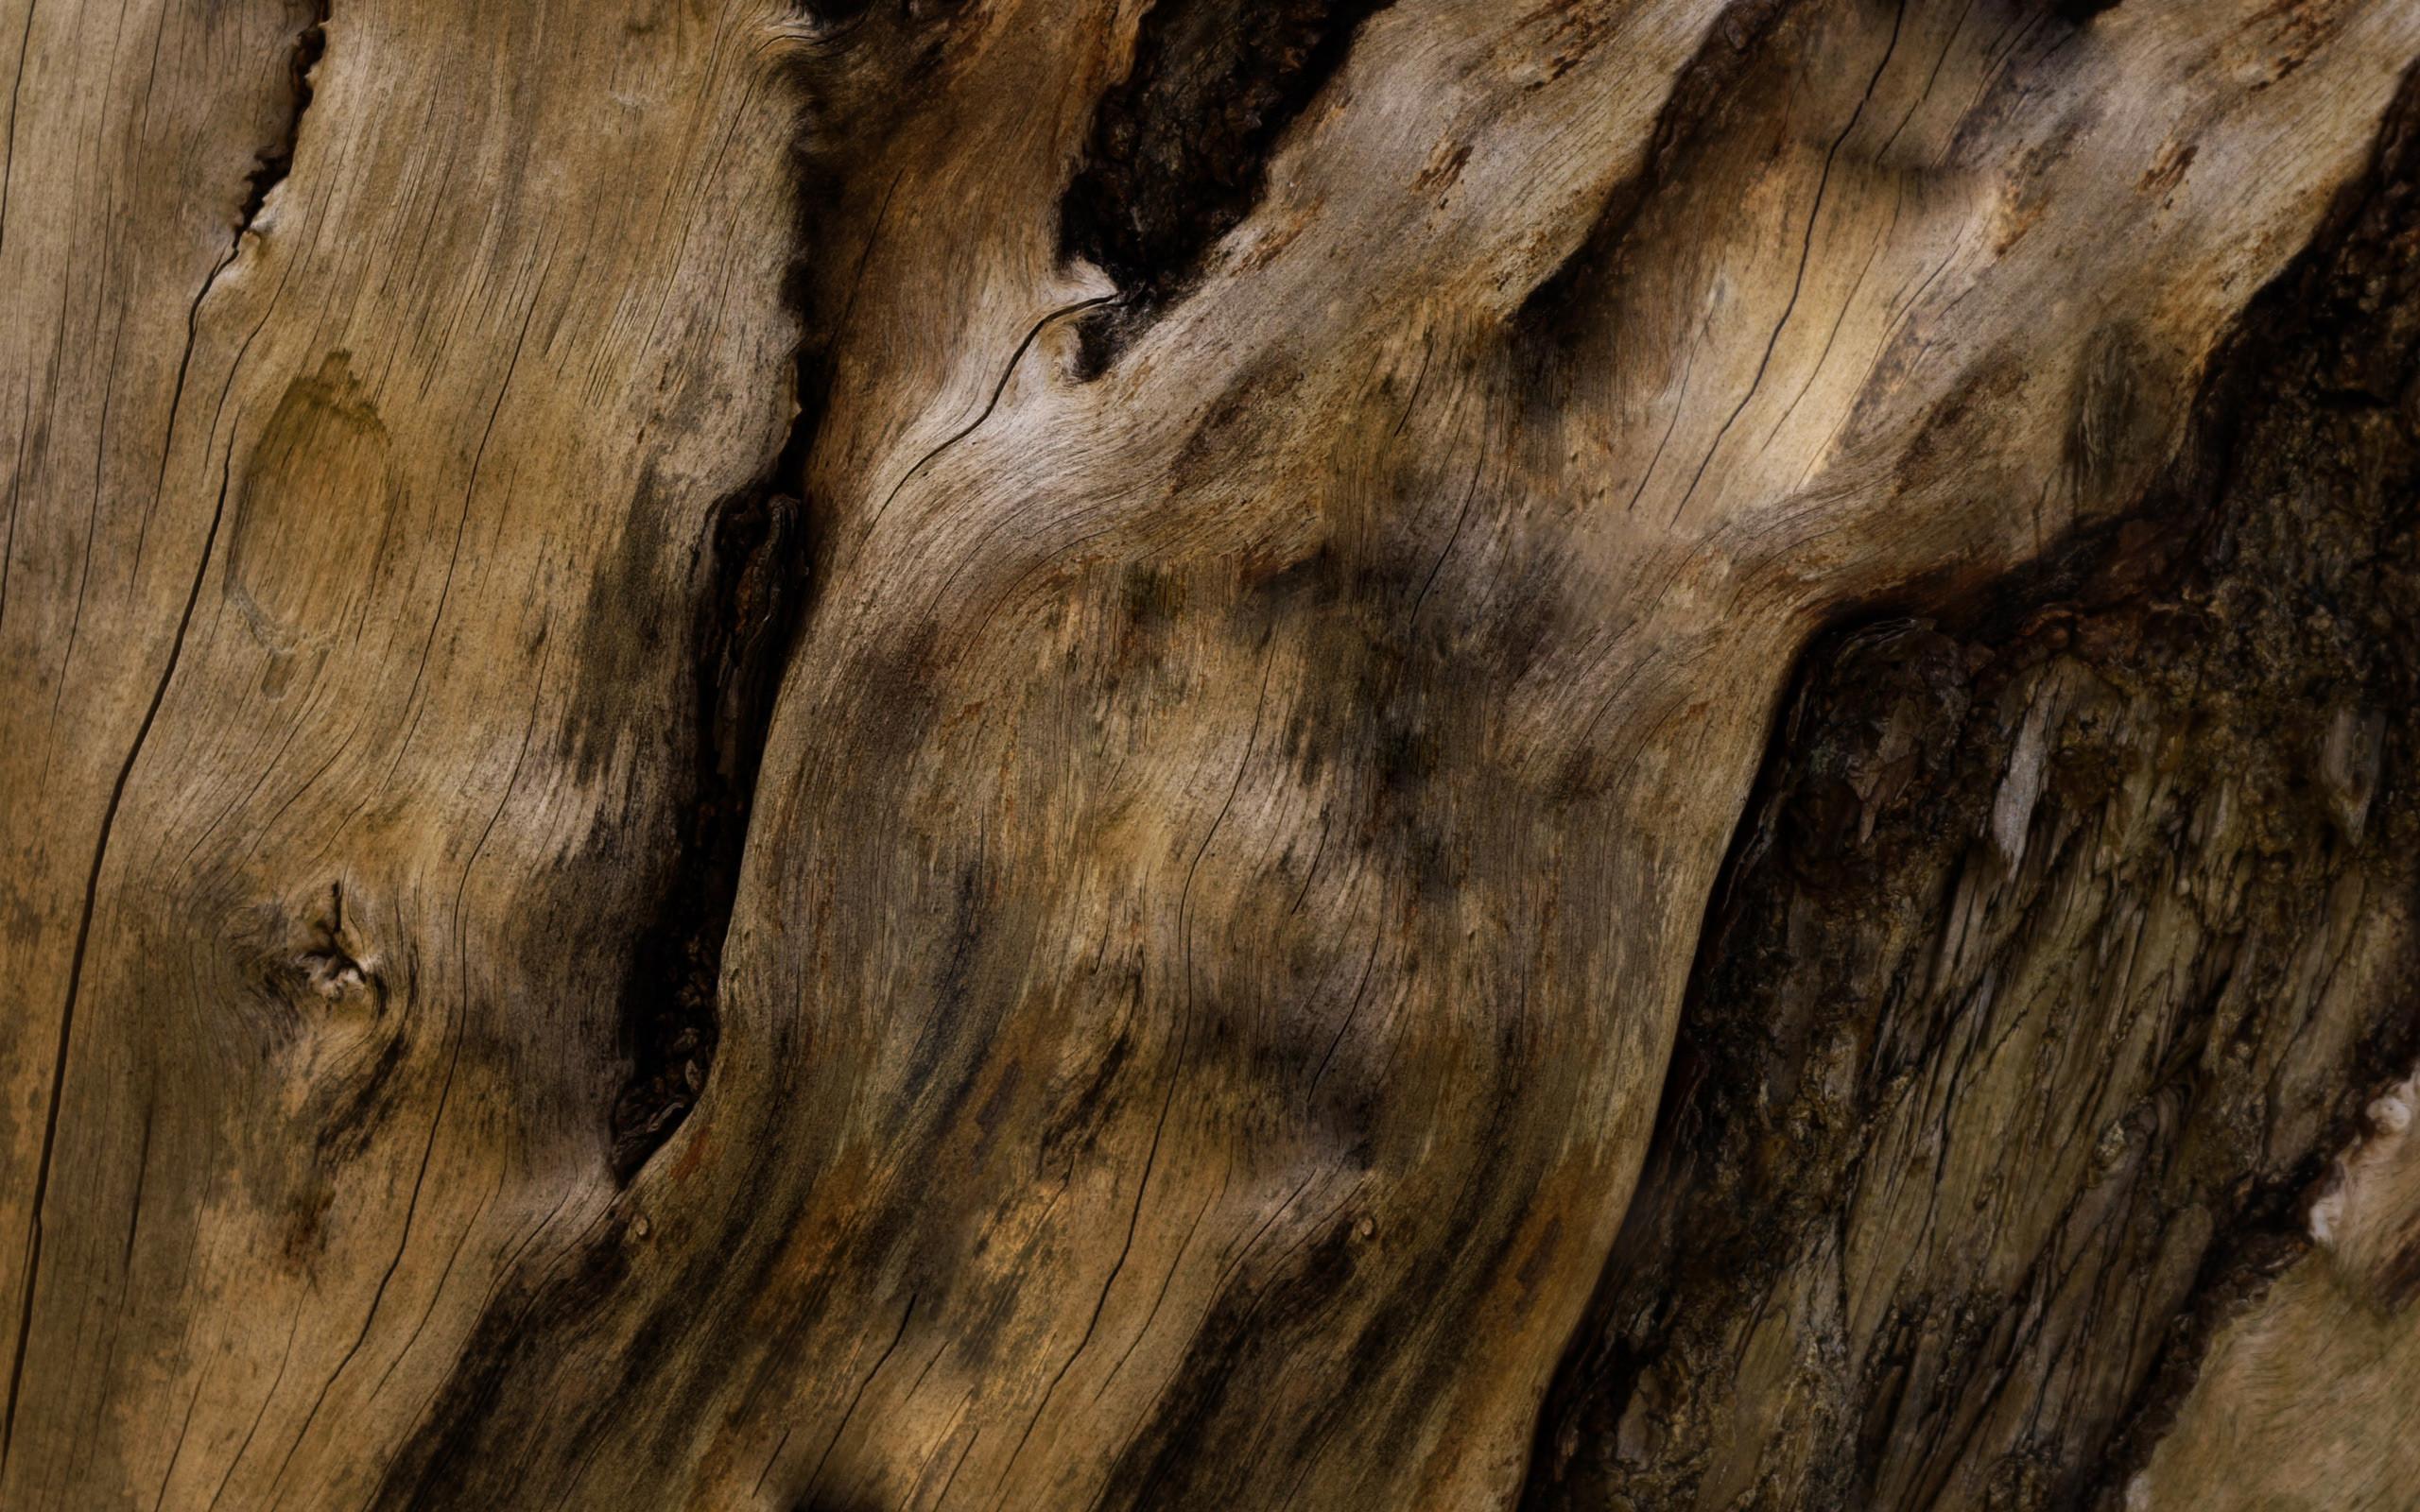 Wood Grain Desktop Wallpaper (51+ images)